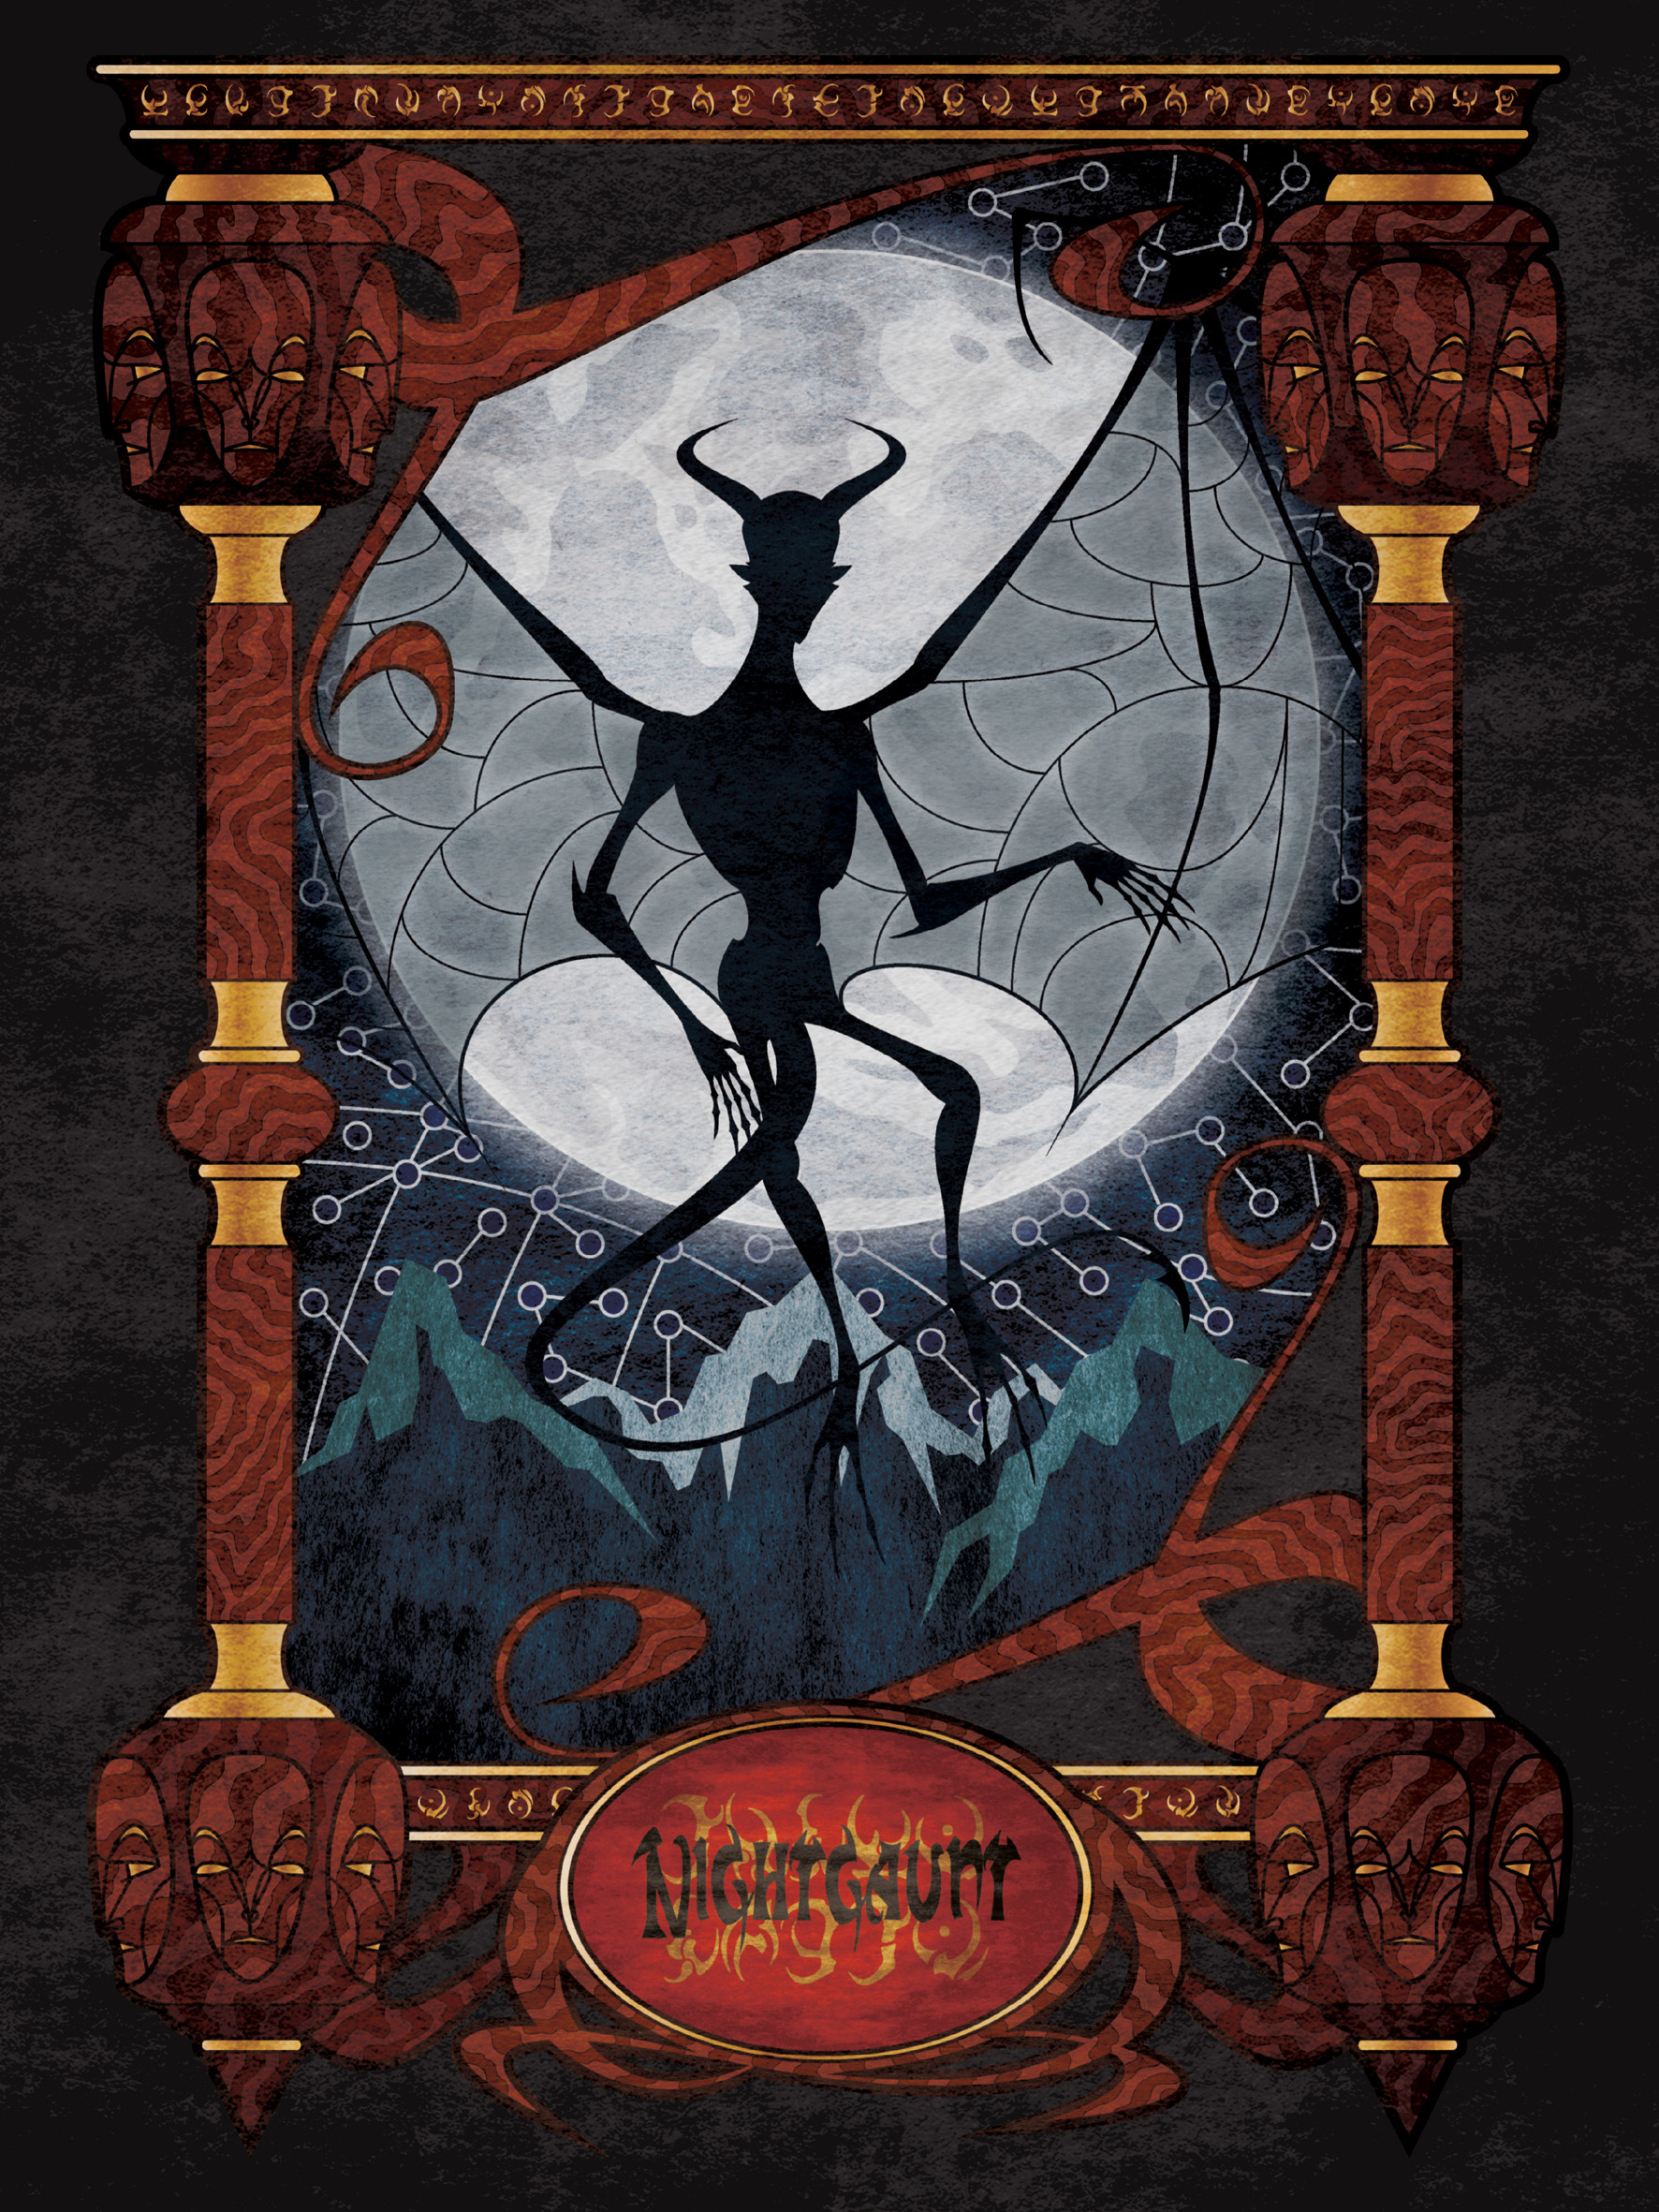 e8f5f4edab ArtStation - Lovecraftian bestiary for kids  Nightgaunt